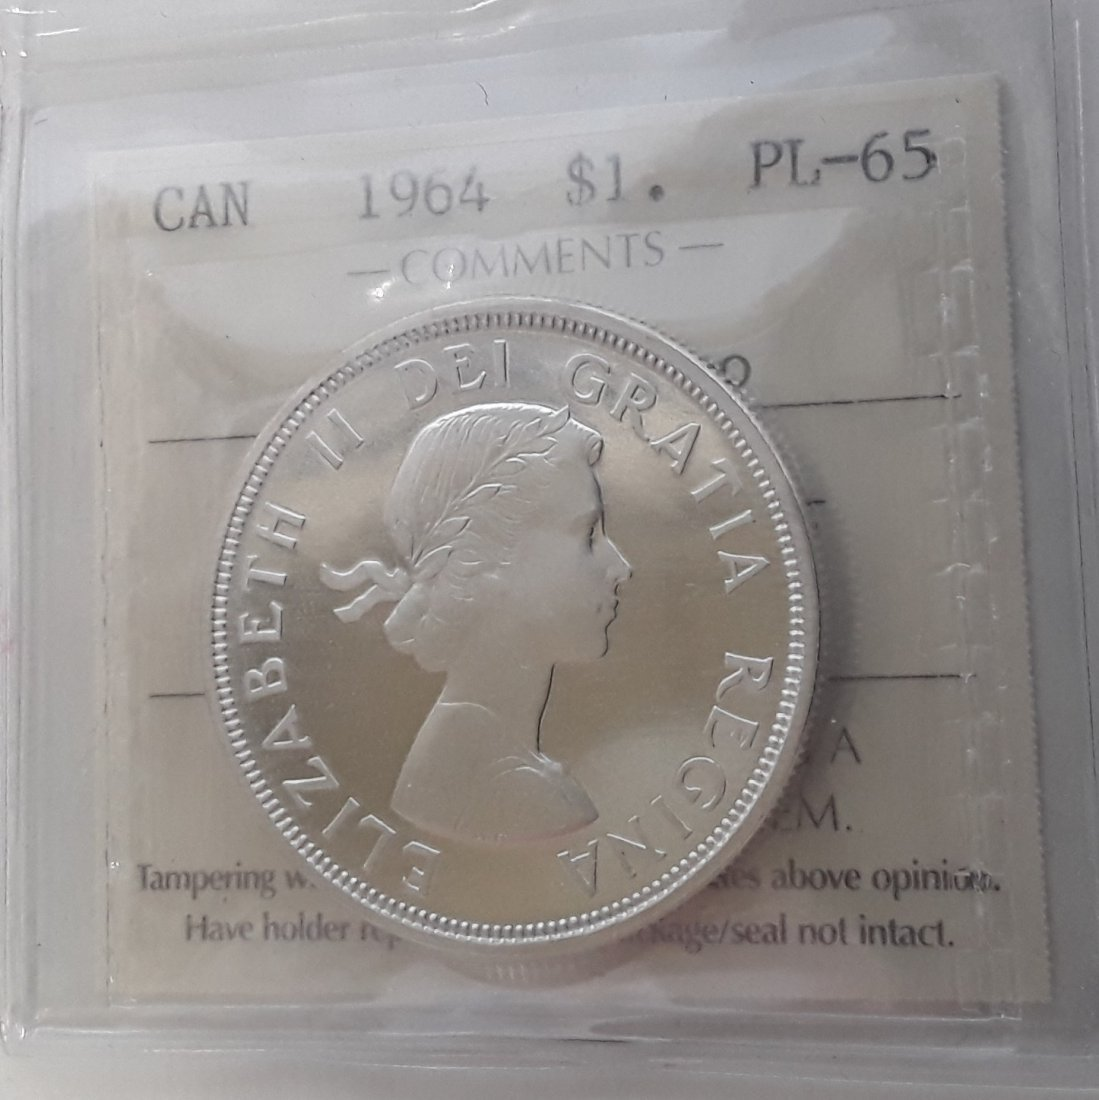 Canadian 1964 Prooflike Set - 7